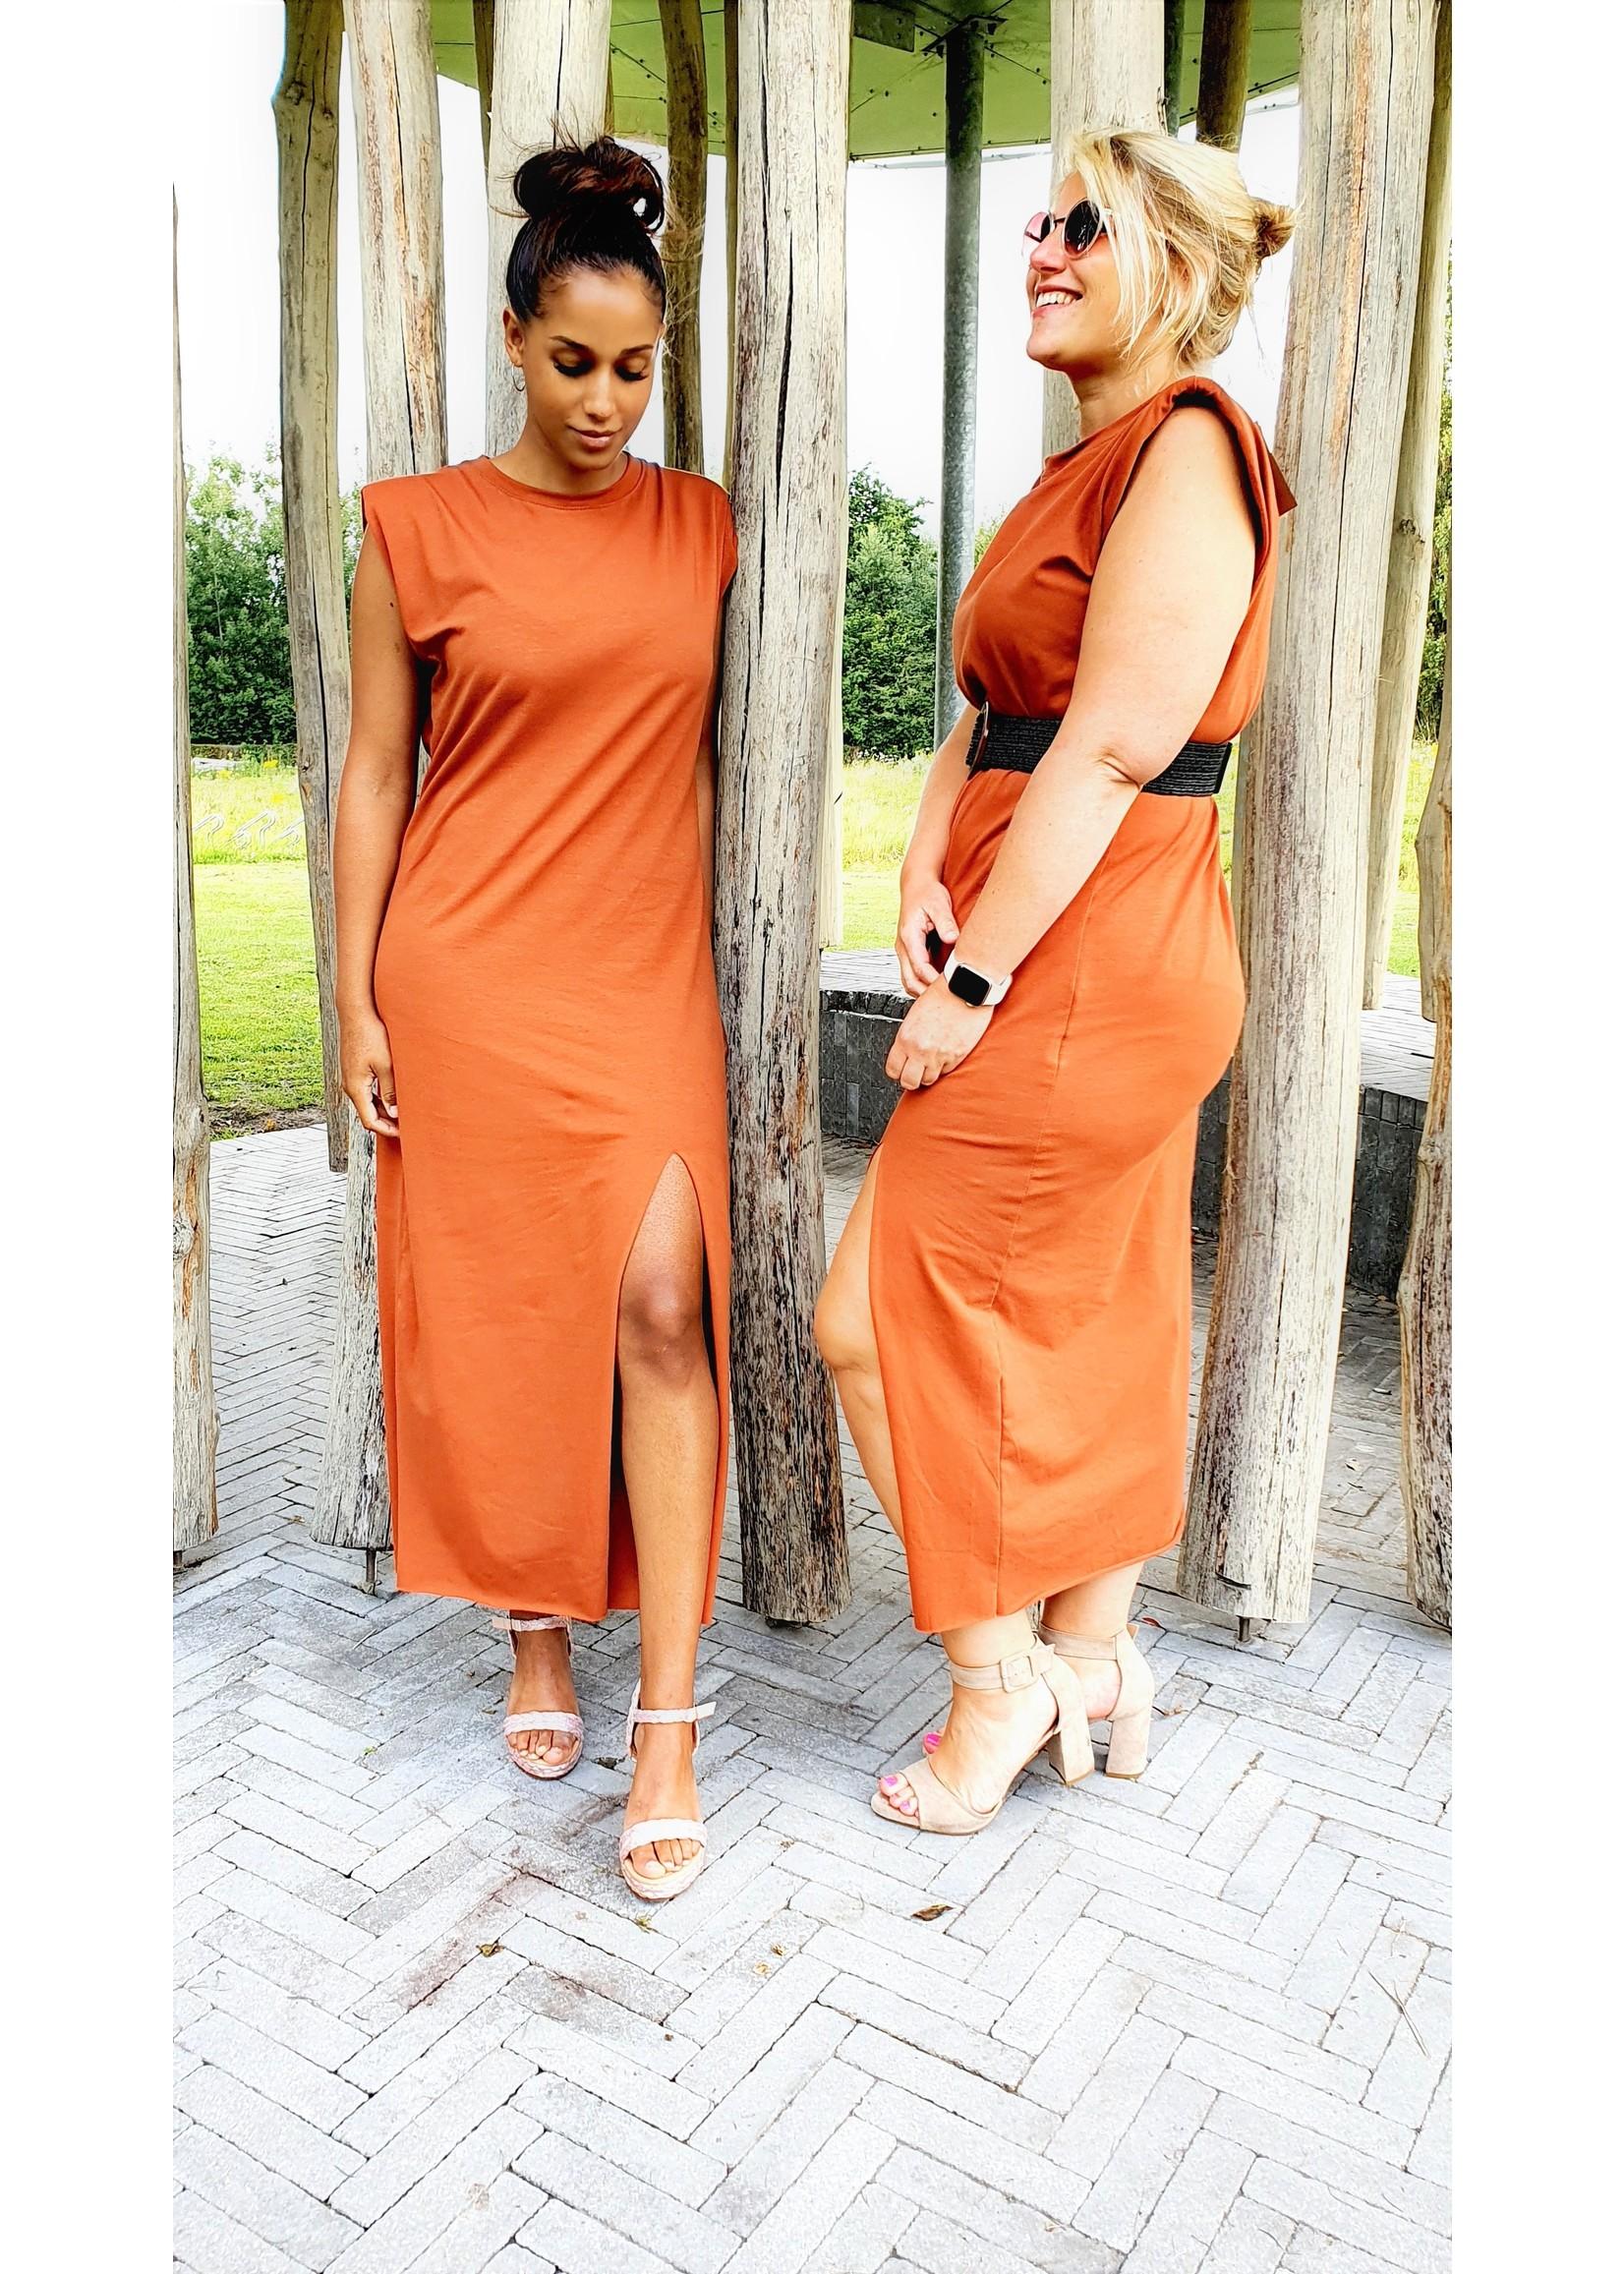 Thé padded terra cotta dress